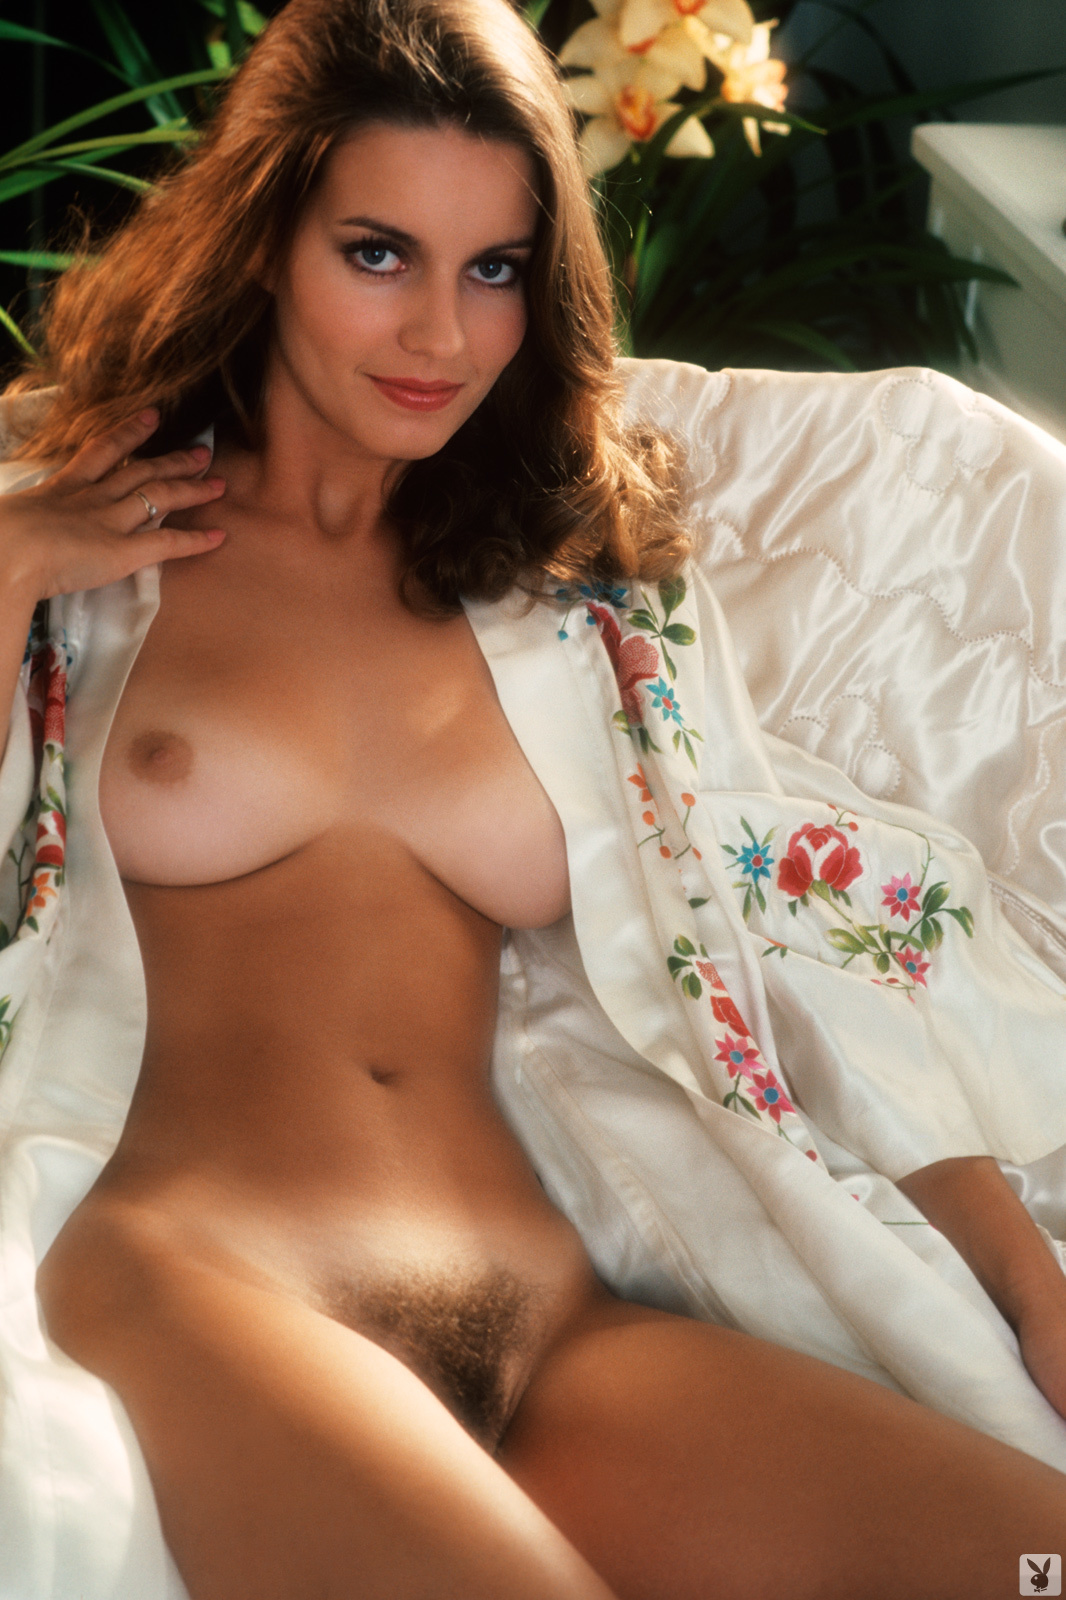 Lisa welch nude